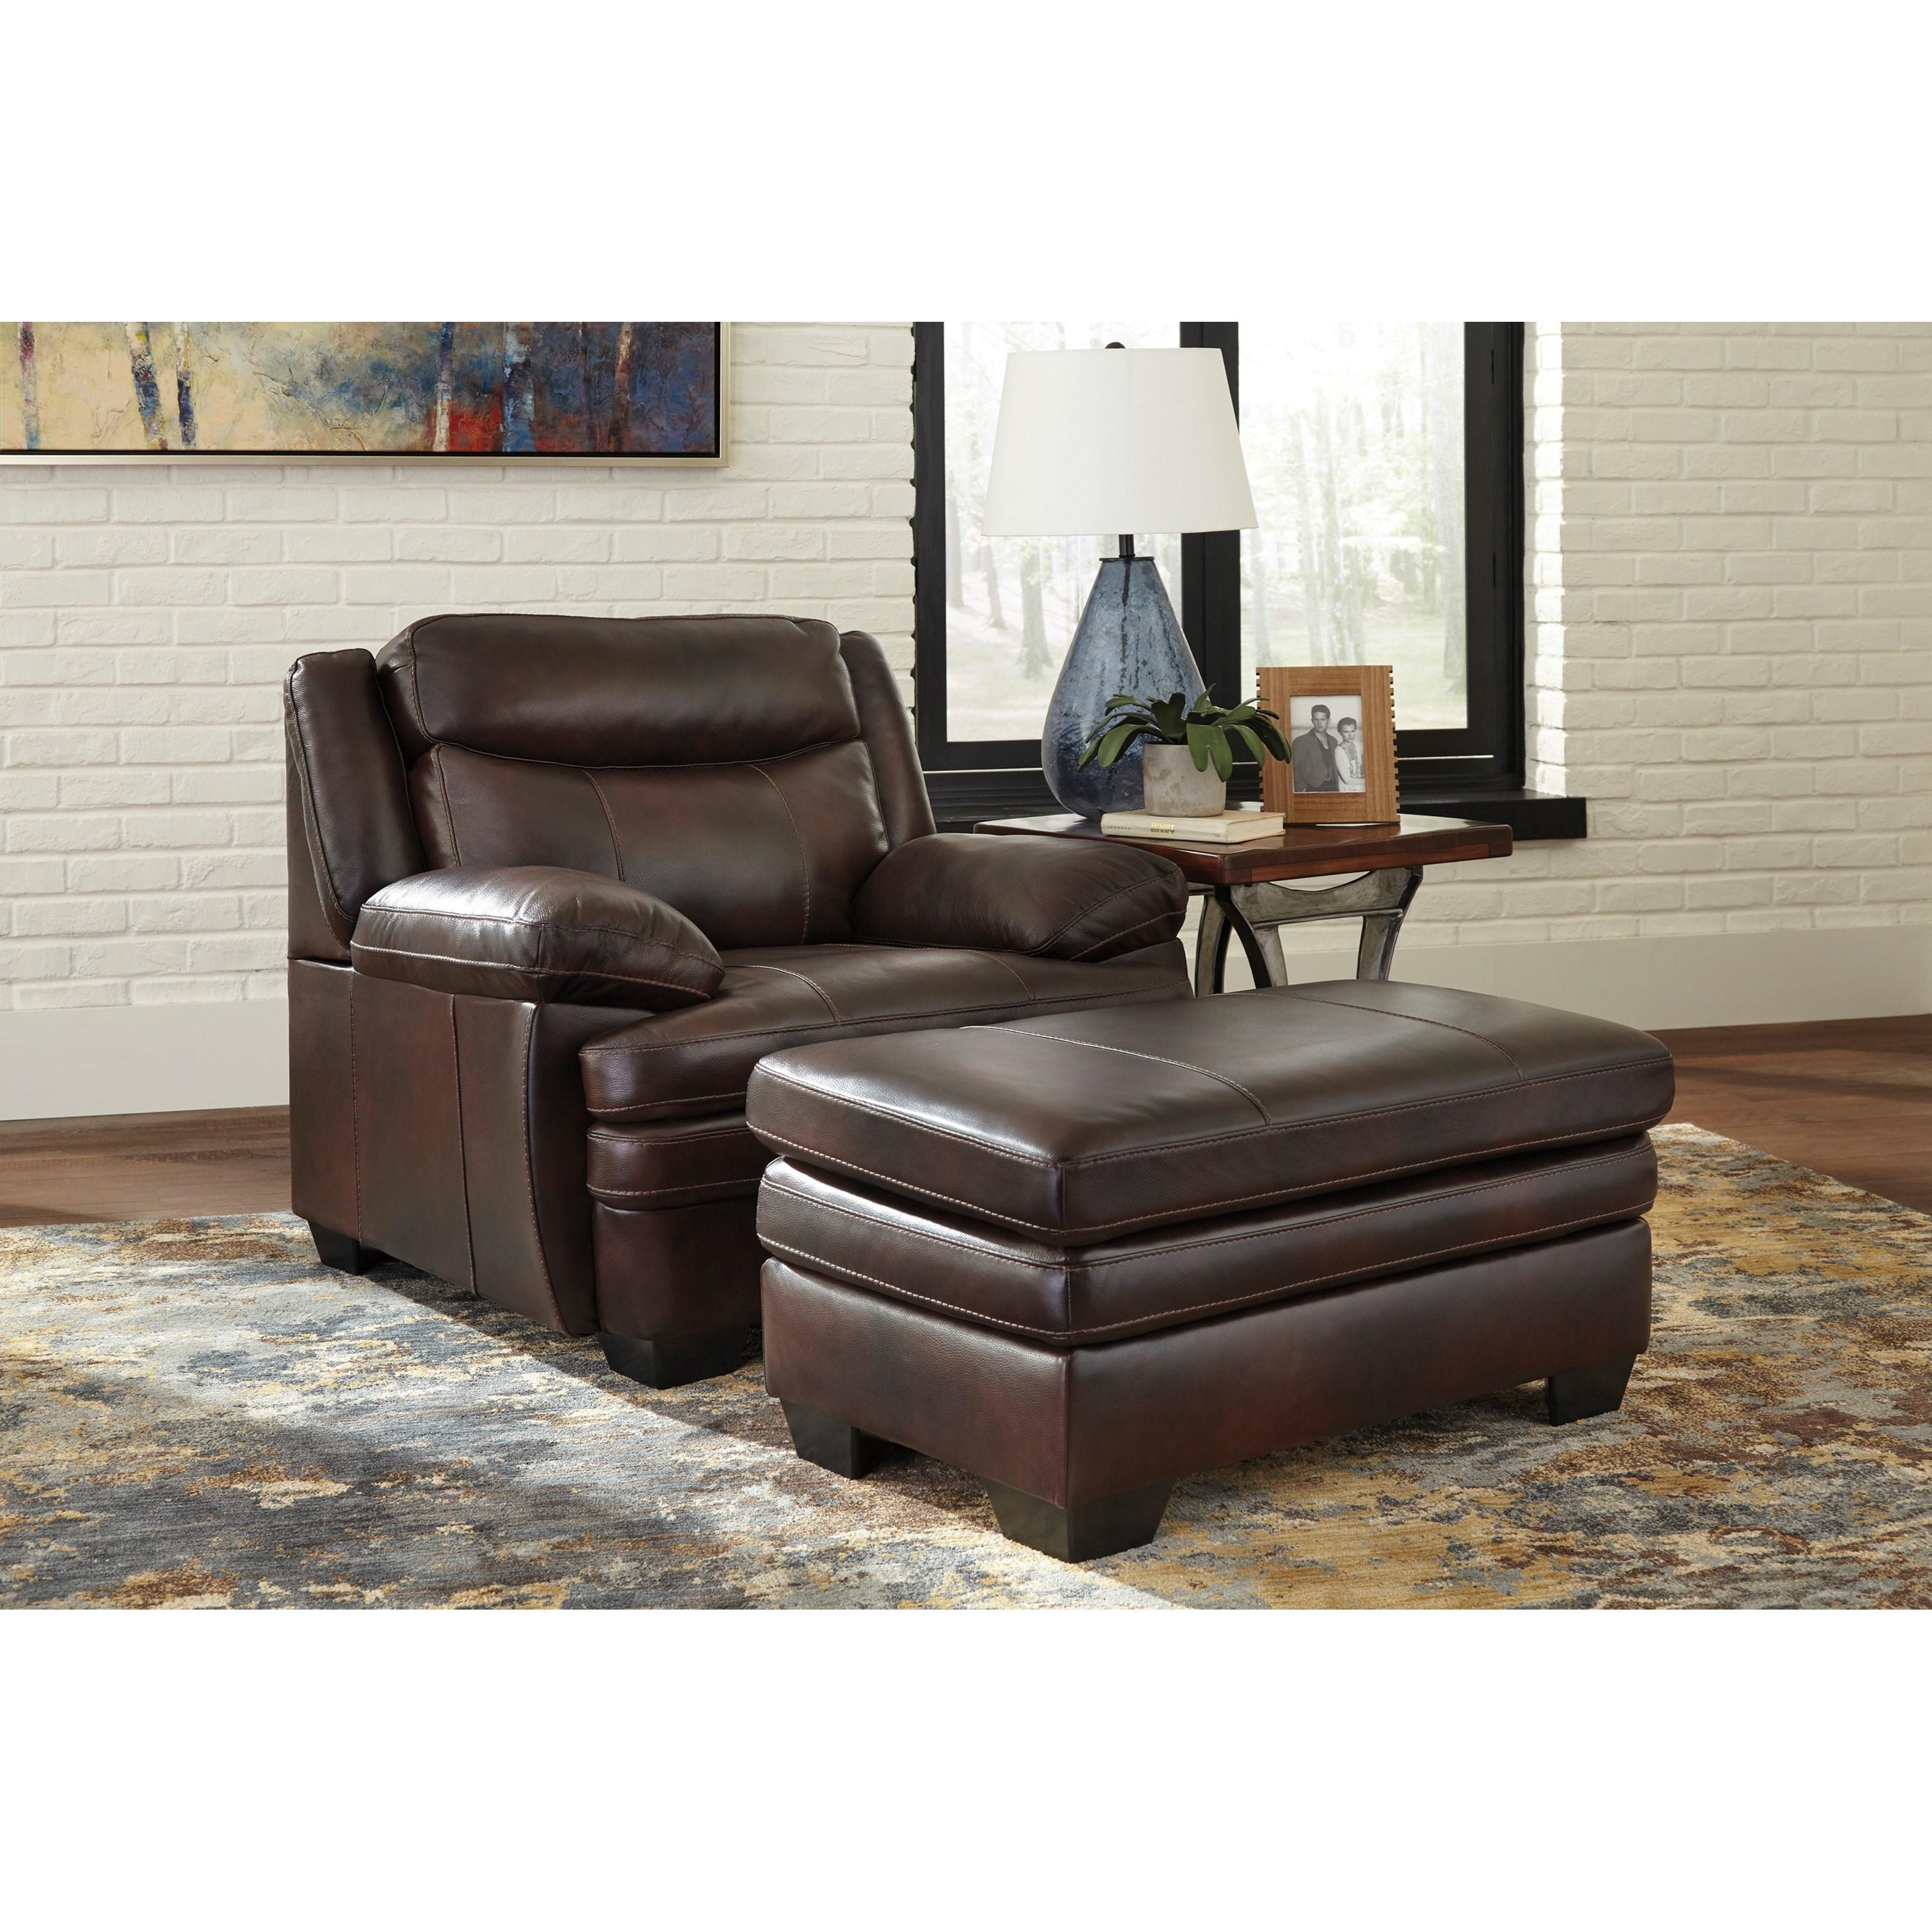 Signature Home Furnishings: Signature Design Hannalore Contemporary Leather Match